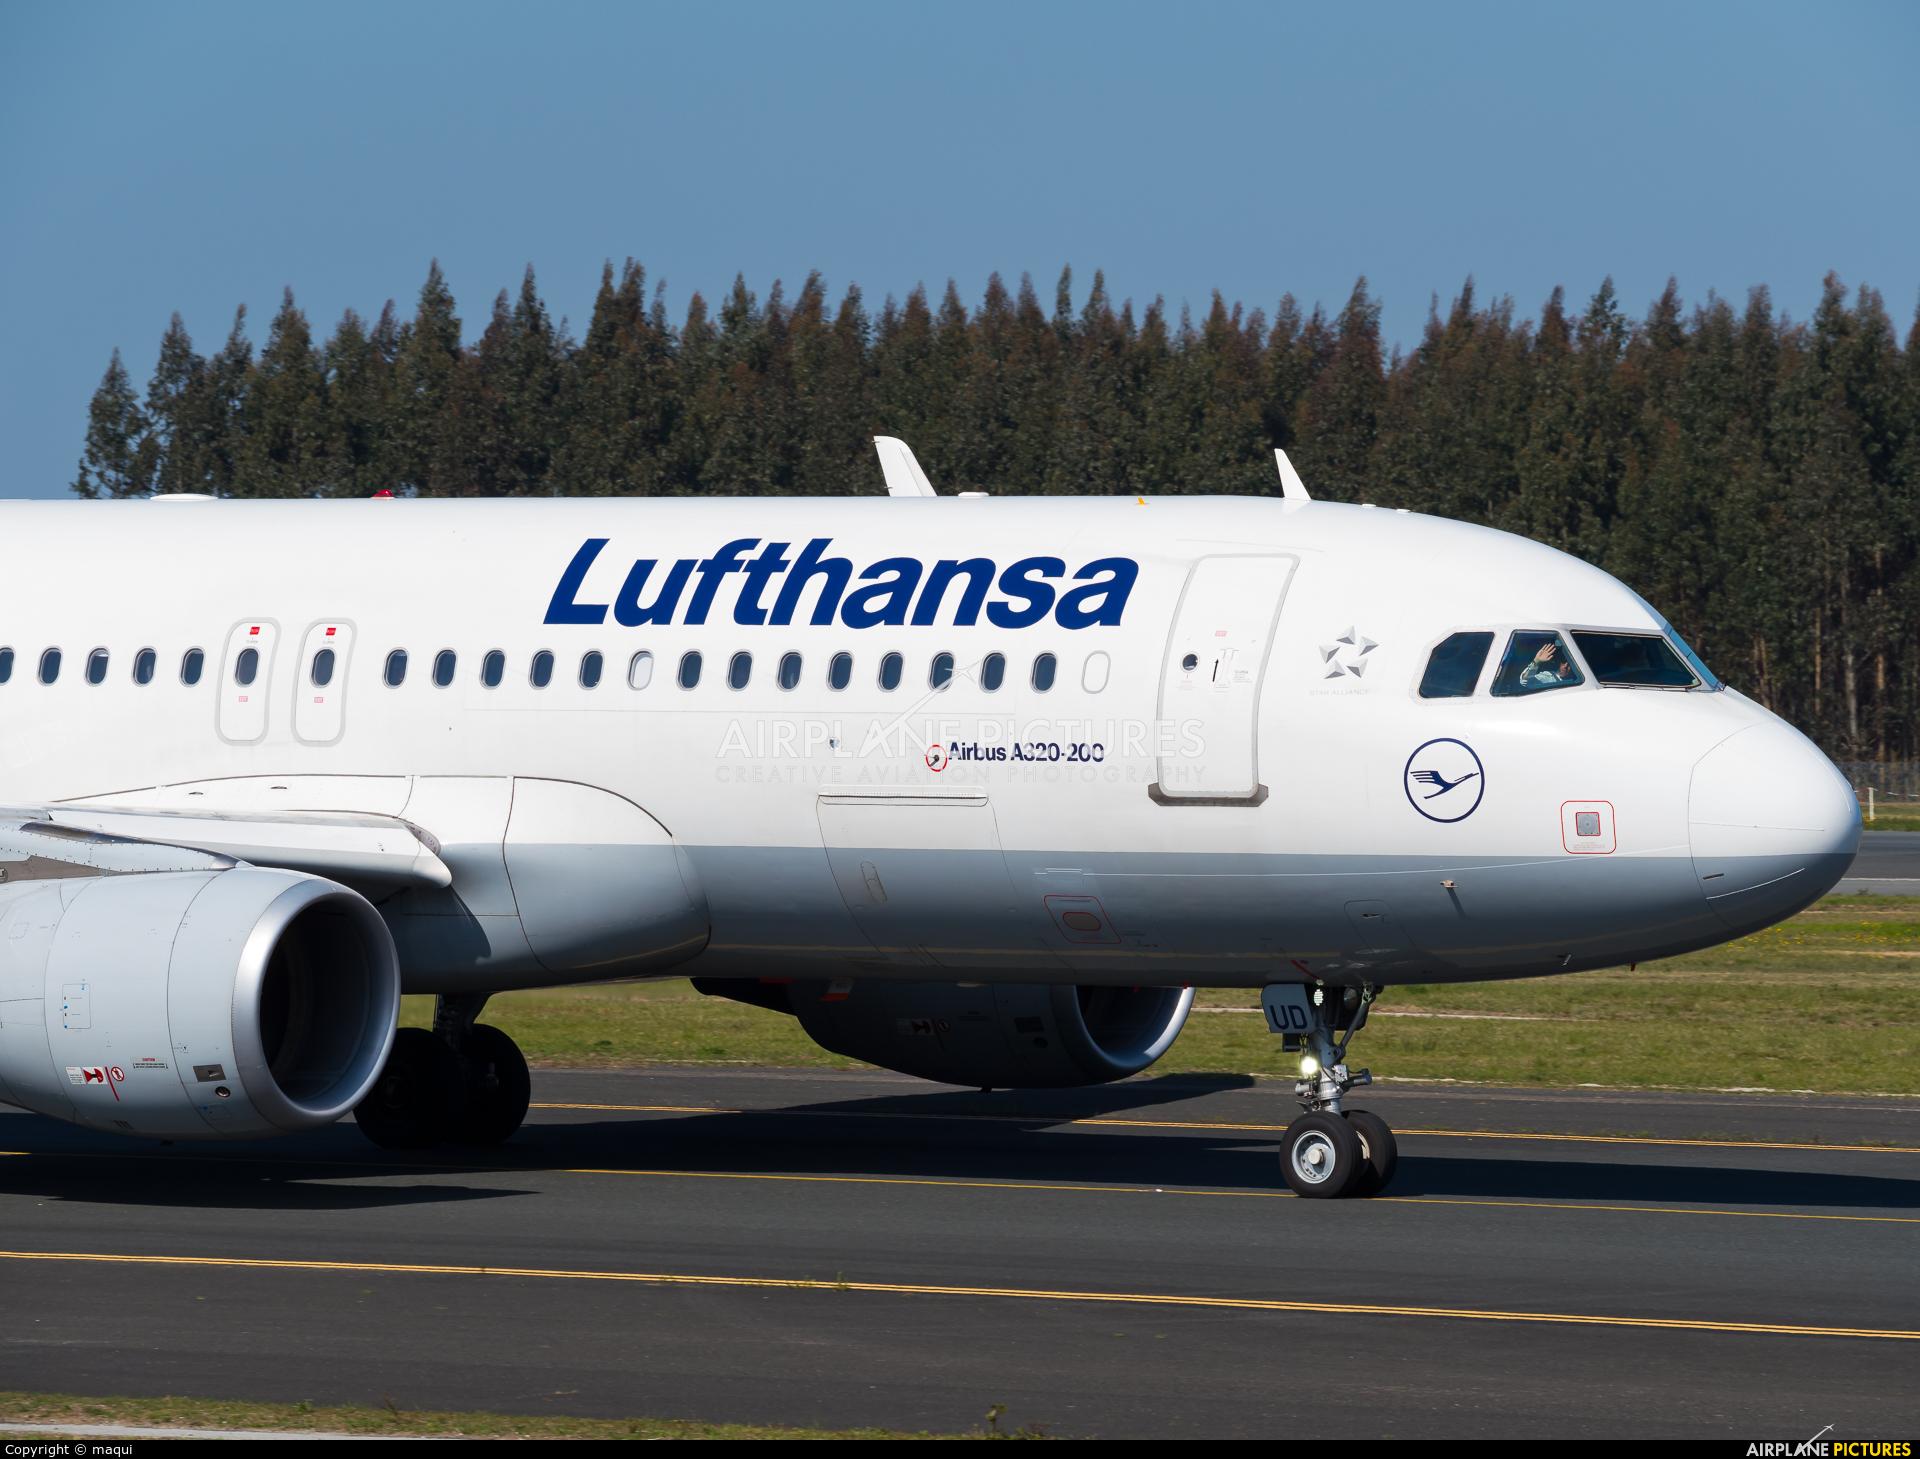 Lufthansa D-AIUD aircraft at Santiago de Compostela